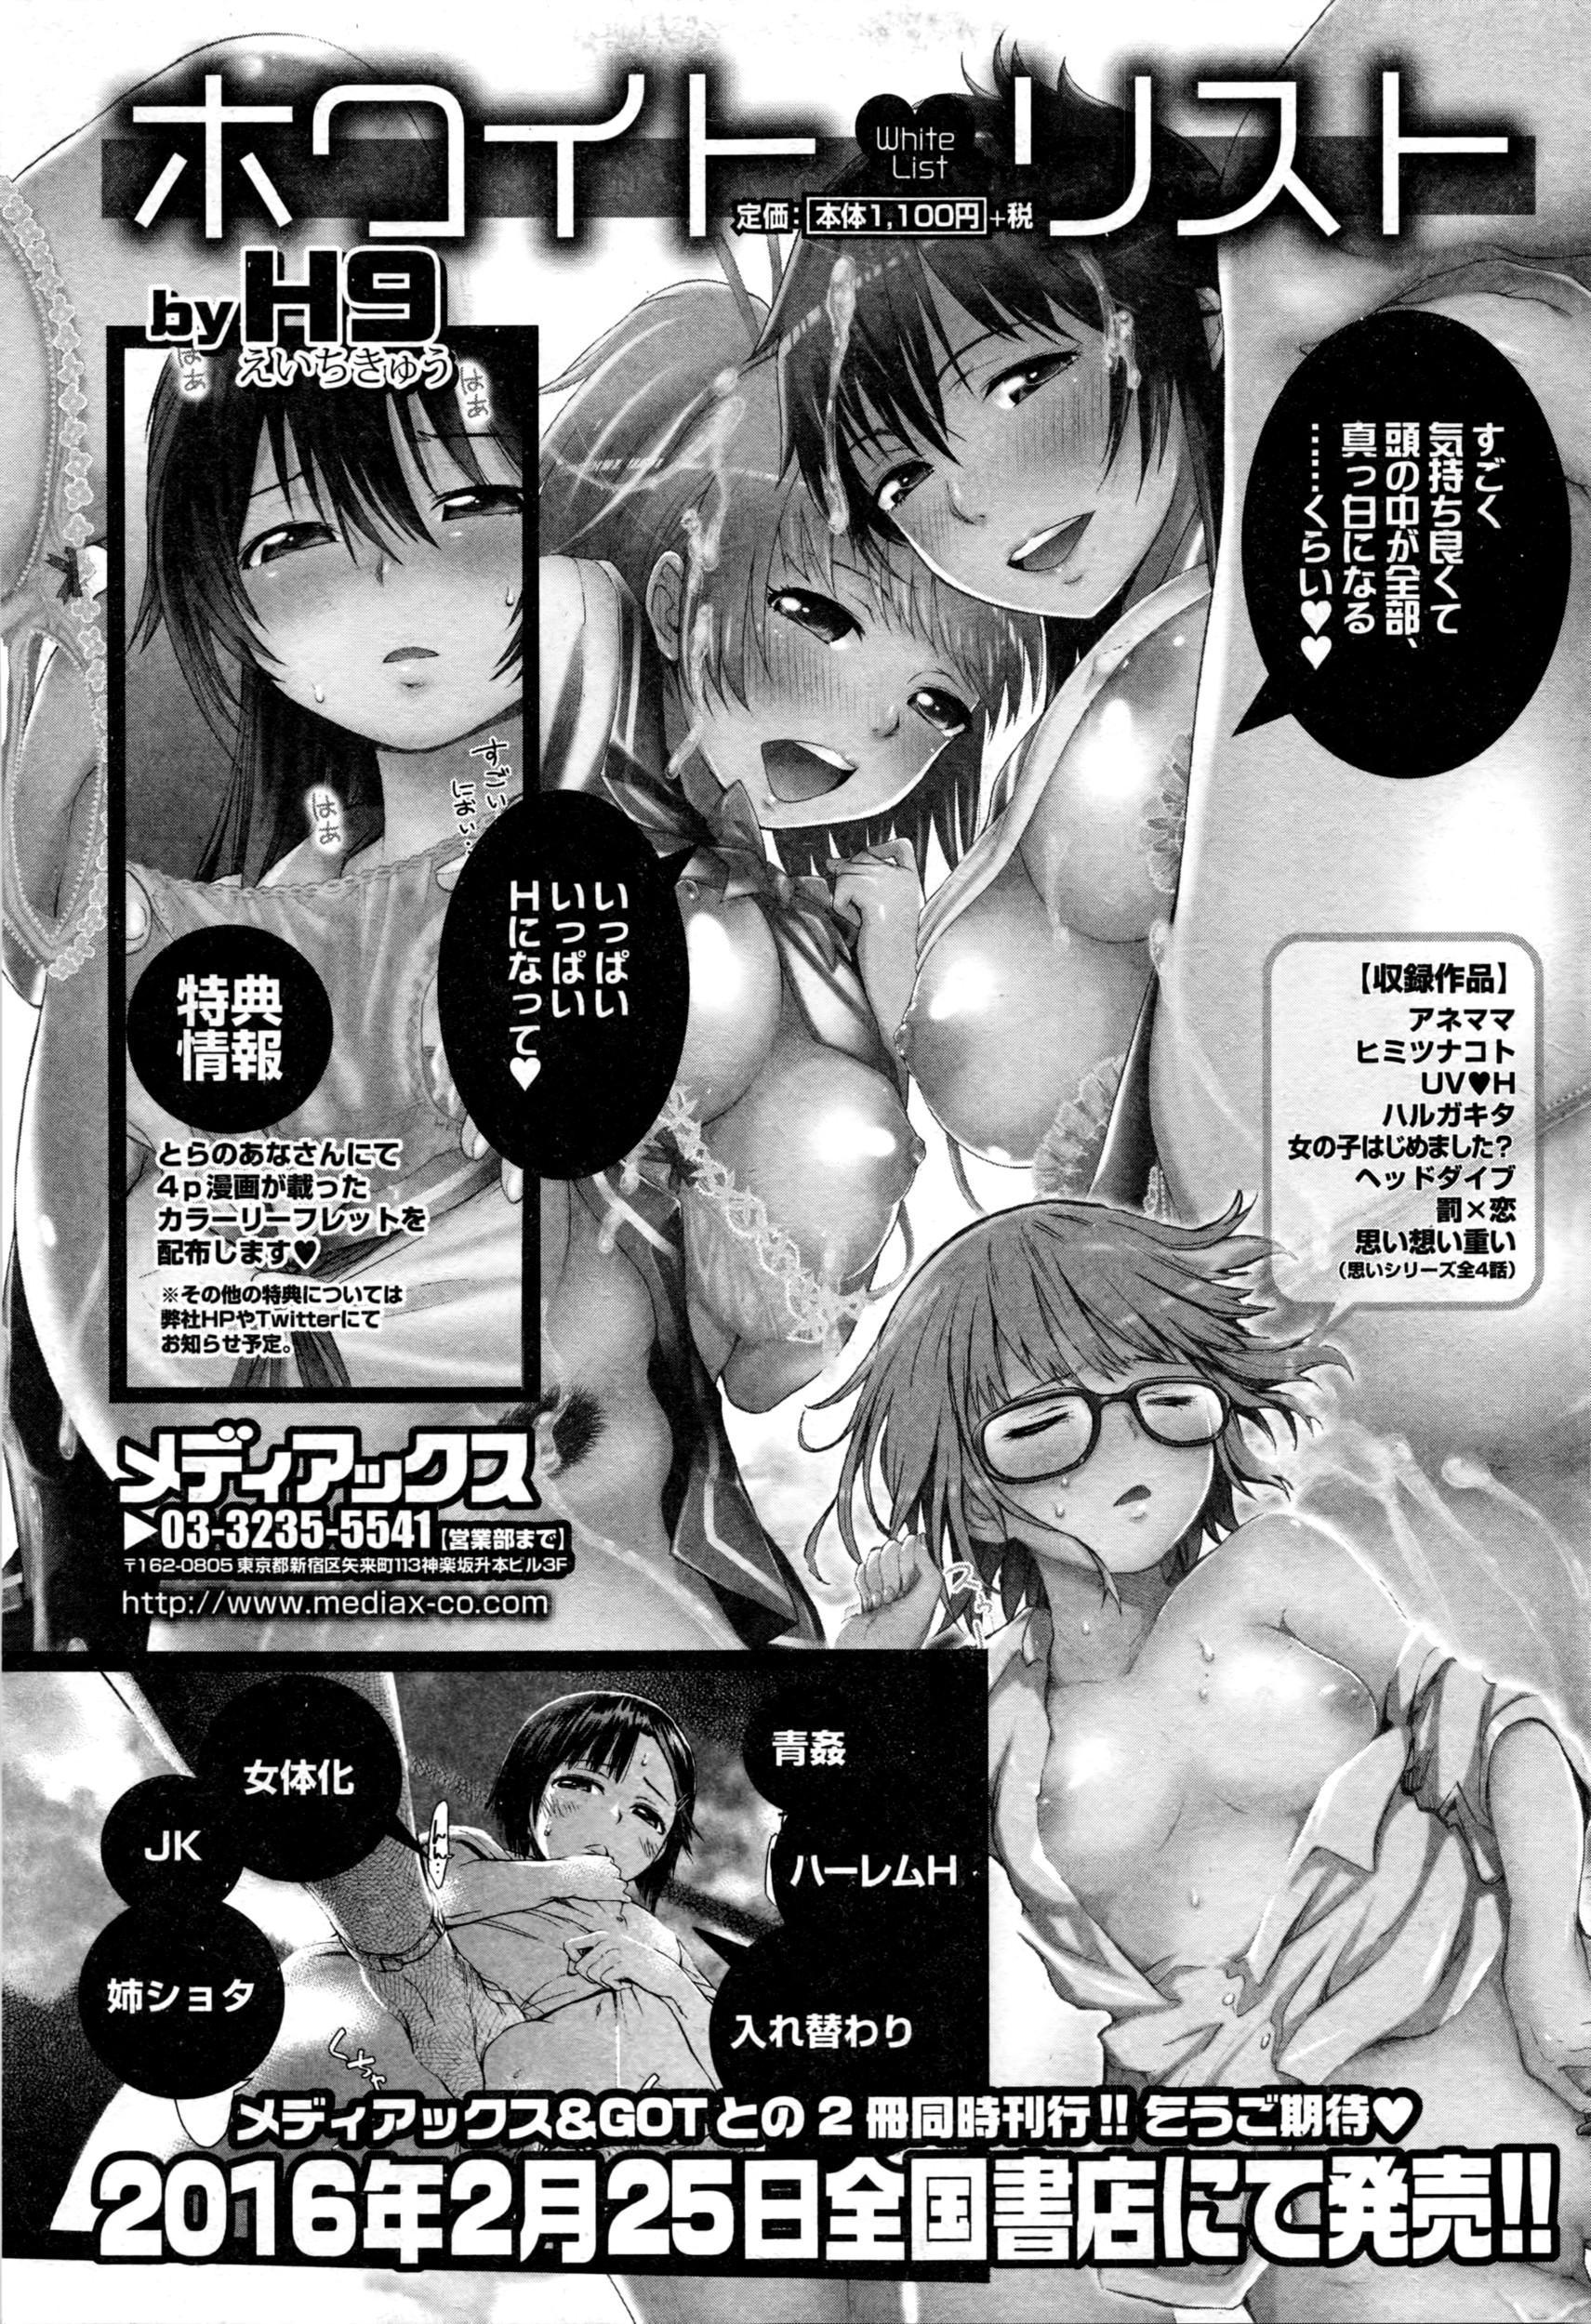 Comic JSCK Vol.3 2016-03 133